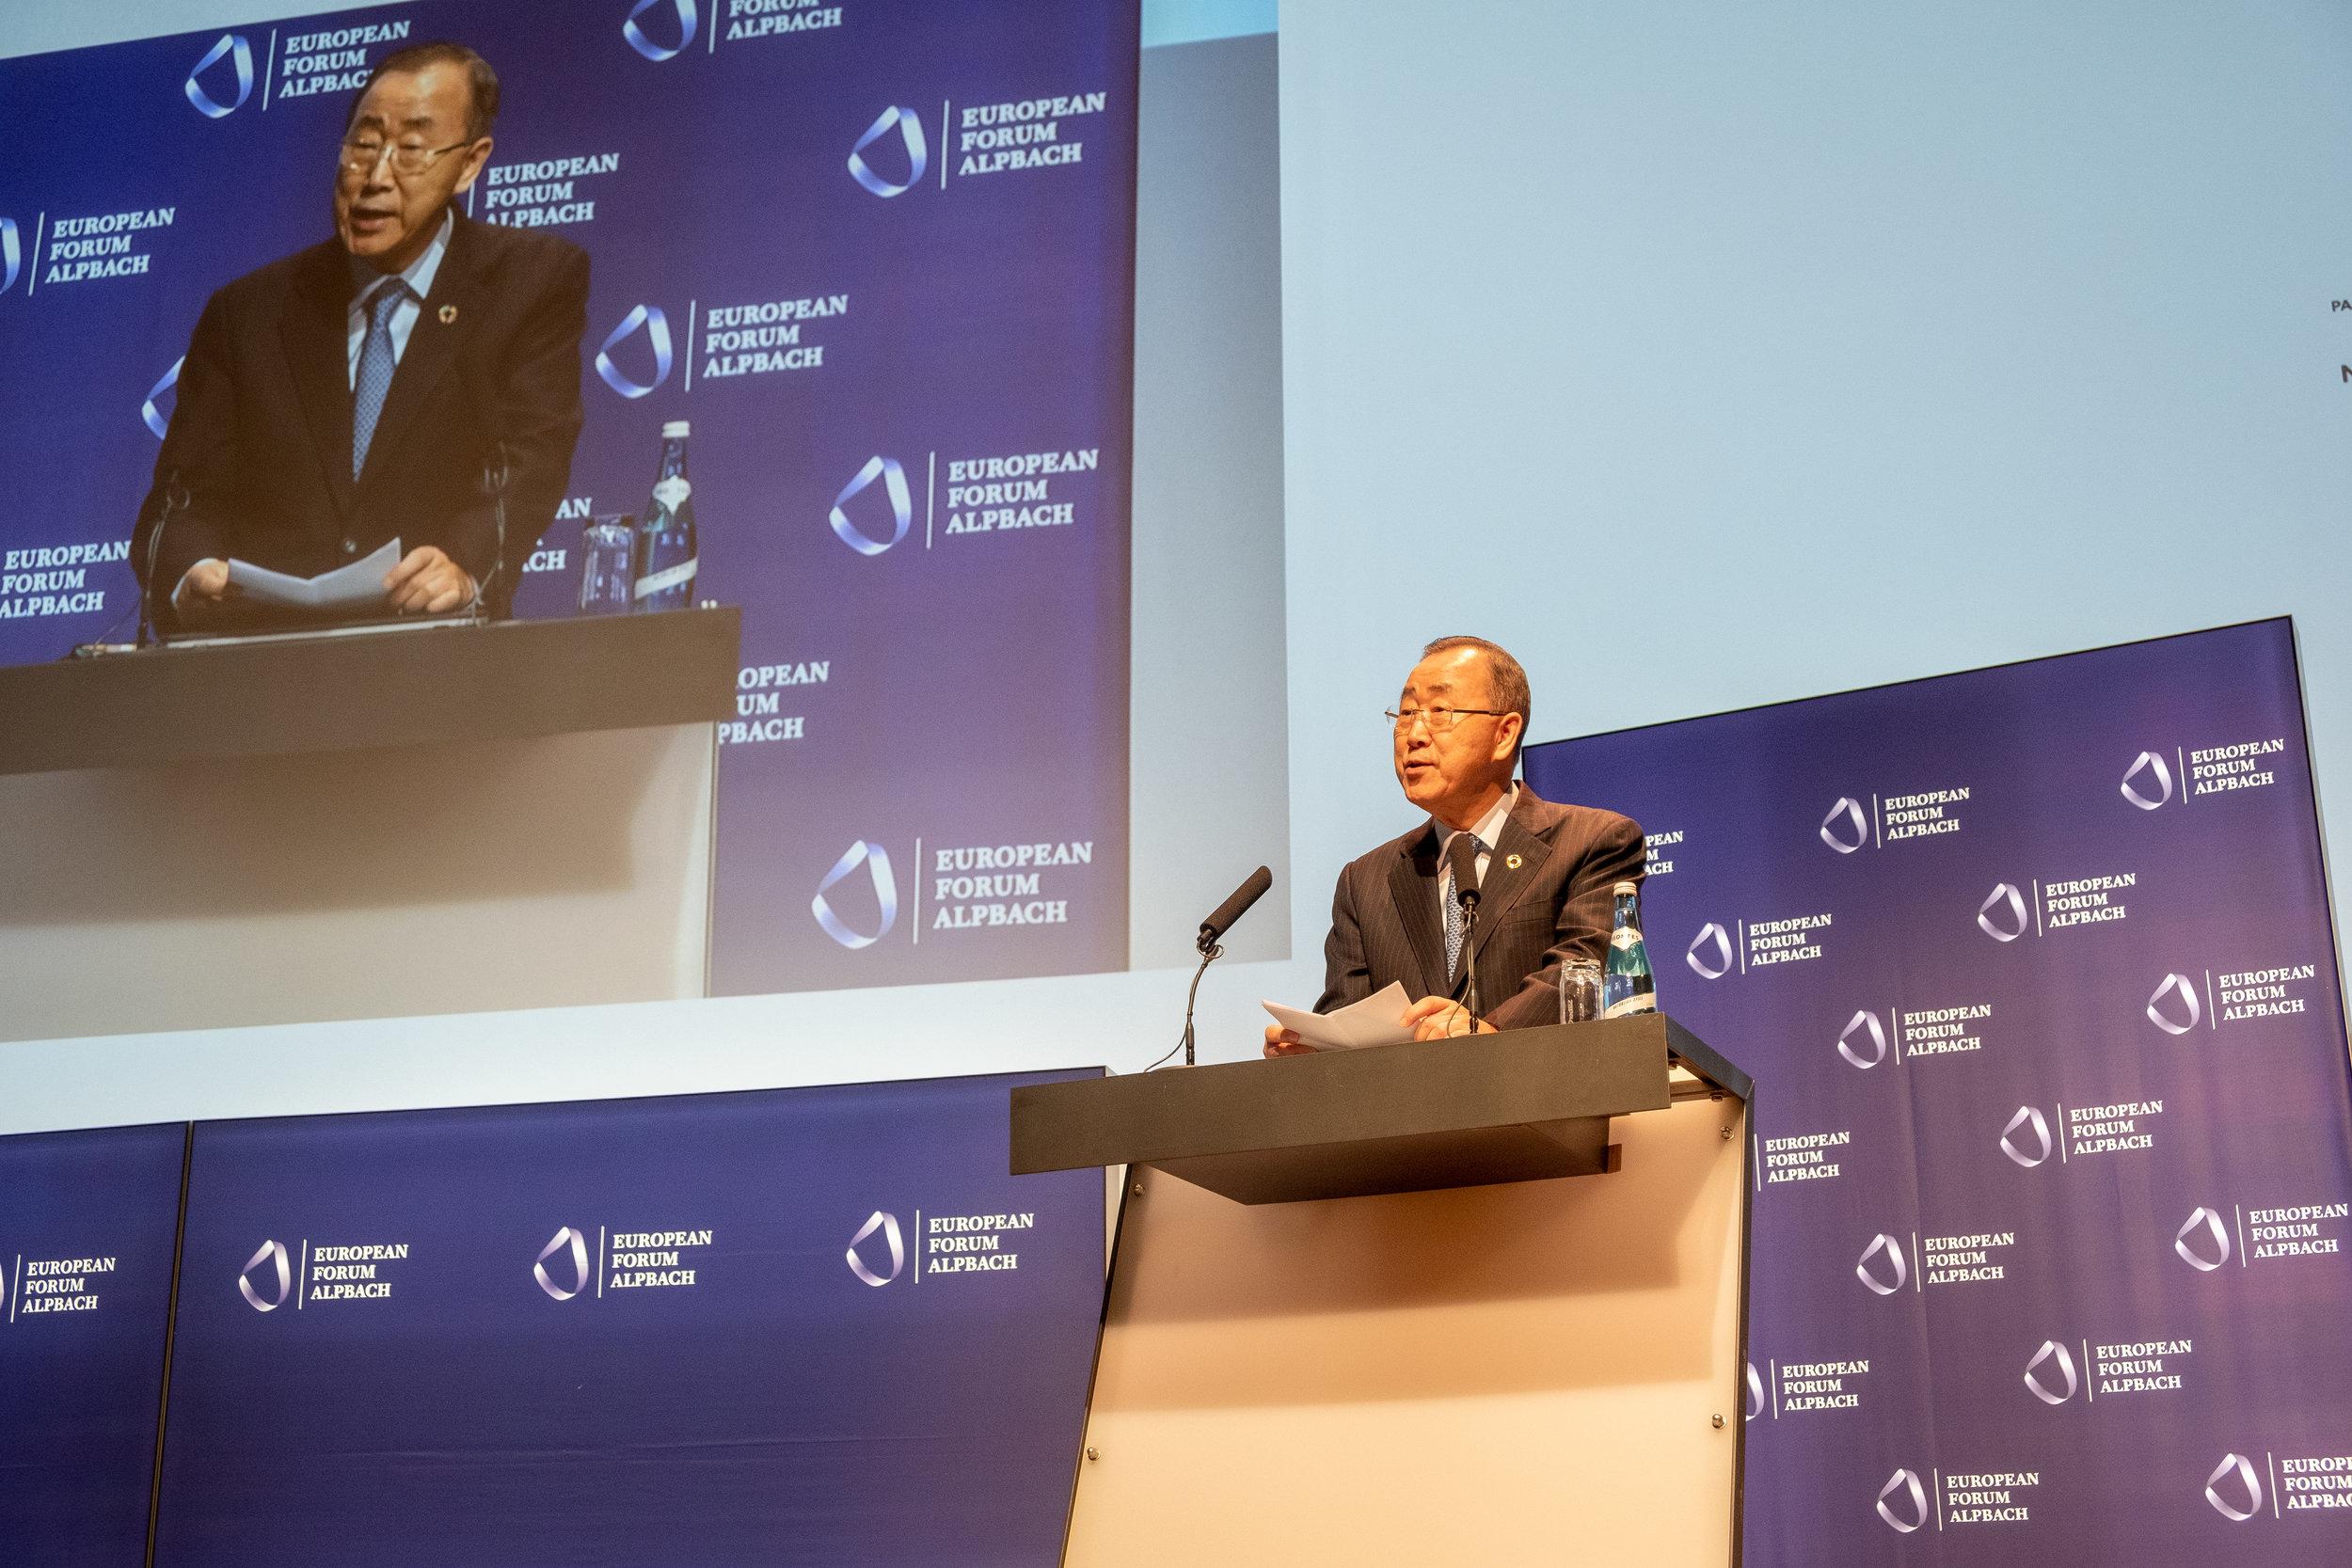 POL Opening, Ban Ki-moon, Credit: Bogdan Baraghin, from https://www.alpbach.org/en/media/pictures/